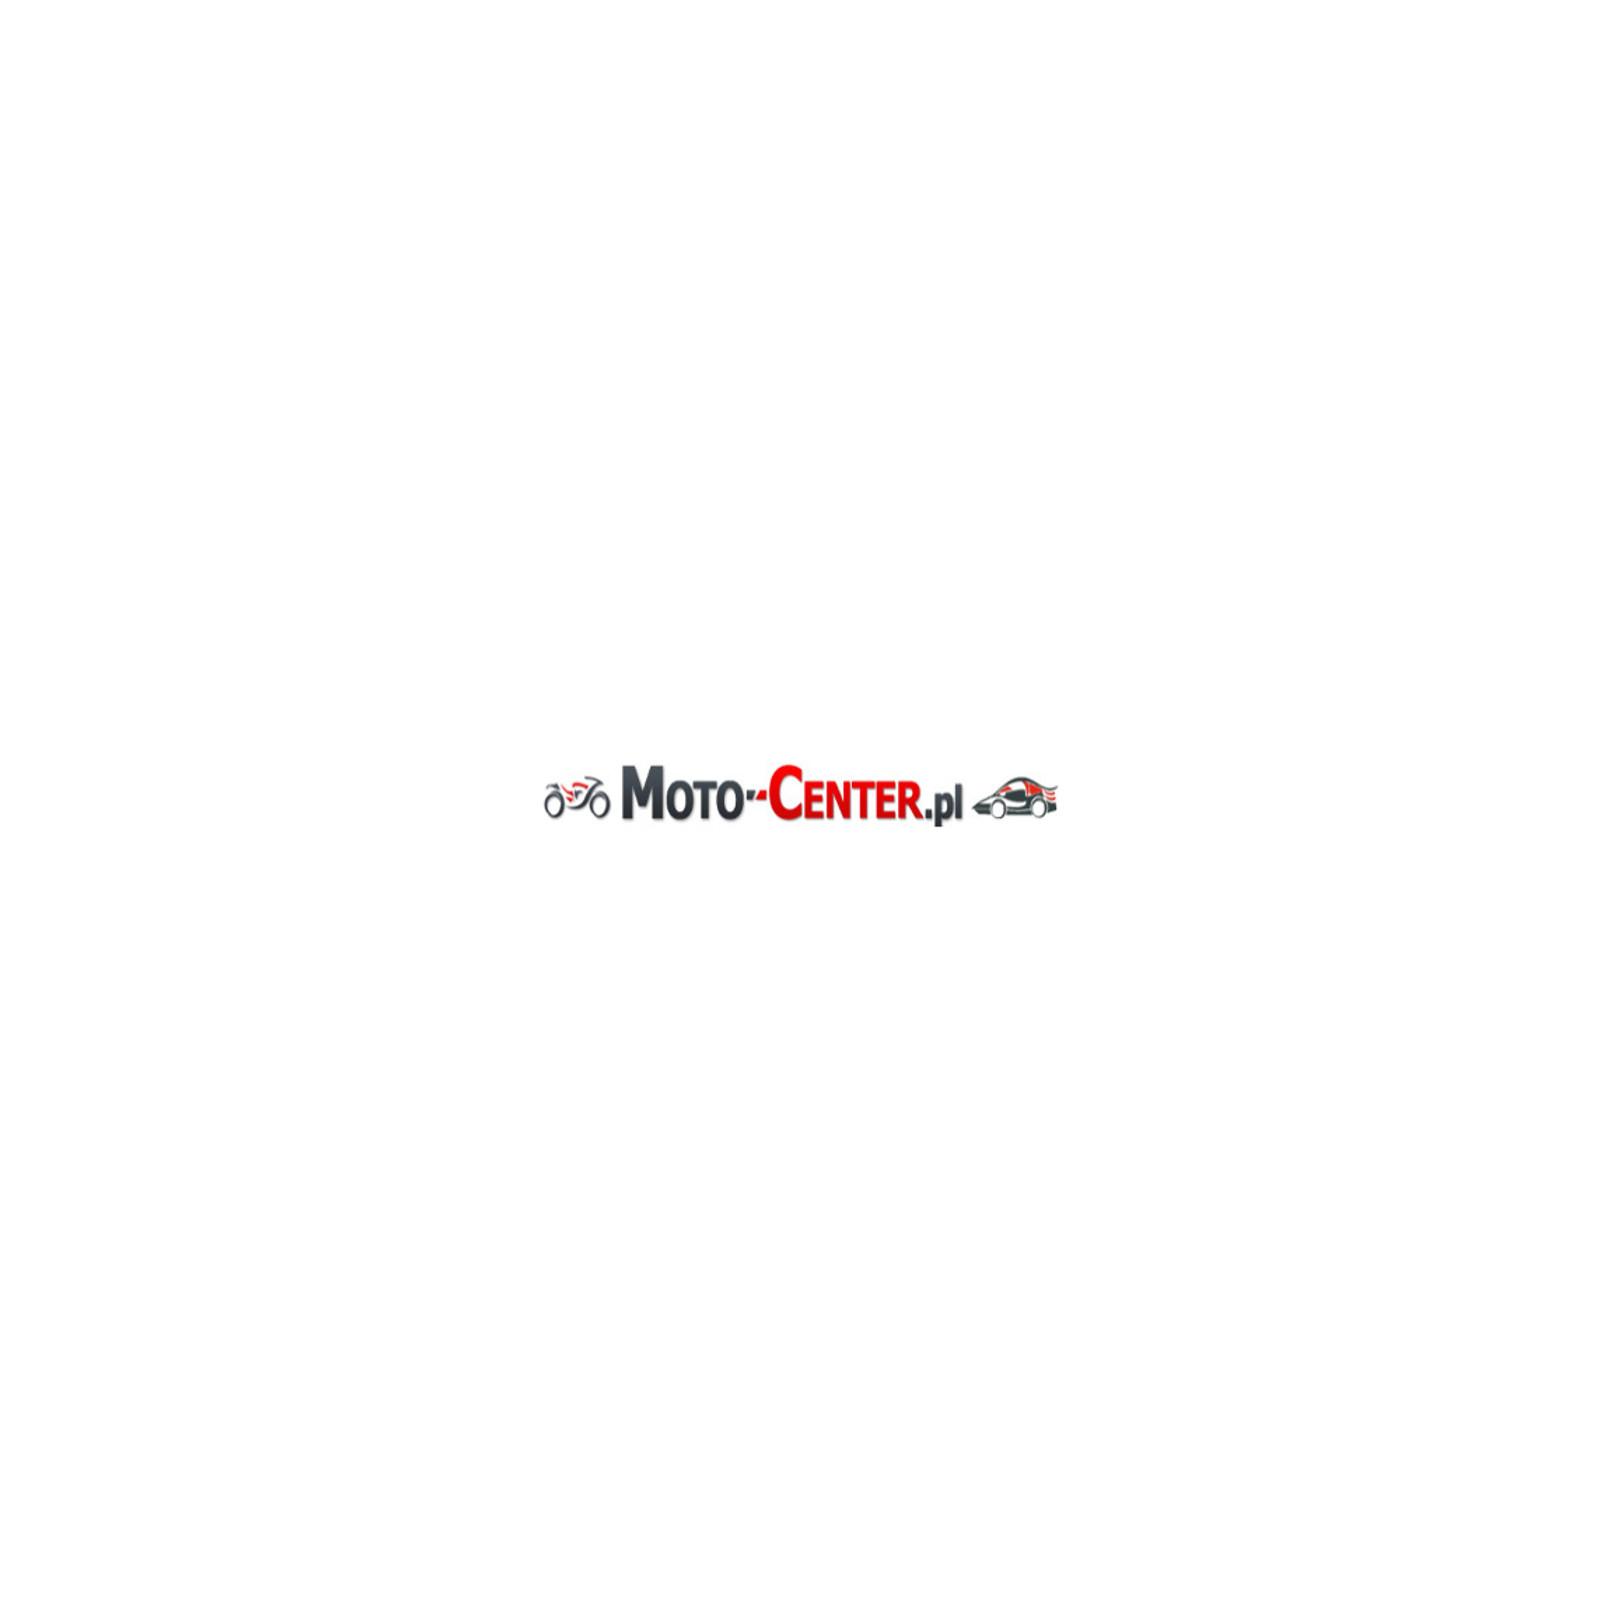 Moto-Center